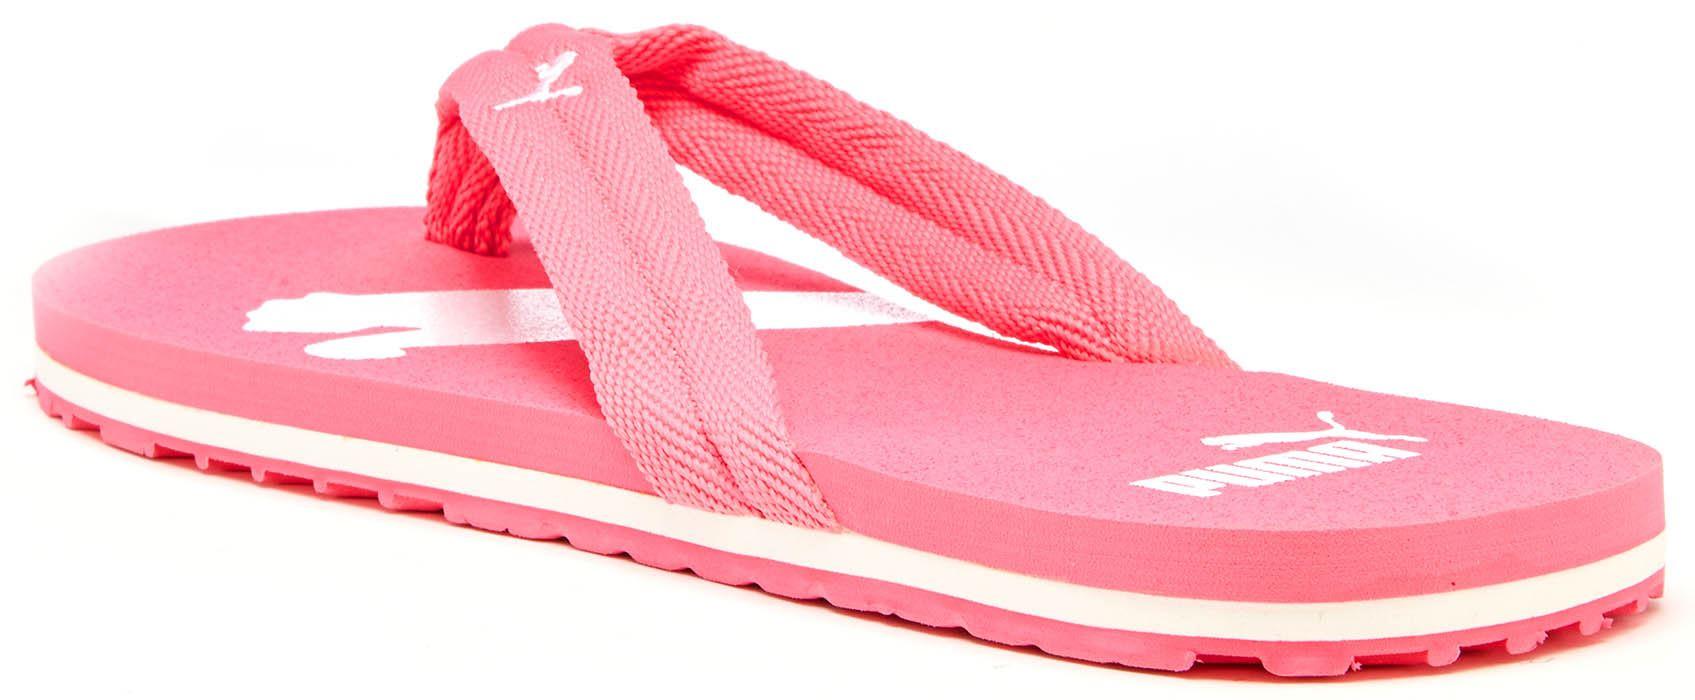 chanclas puma mujer rosa